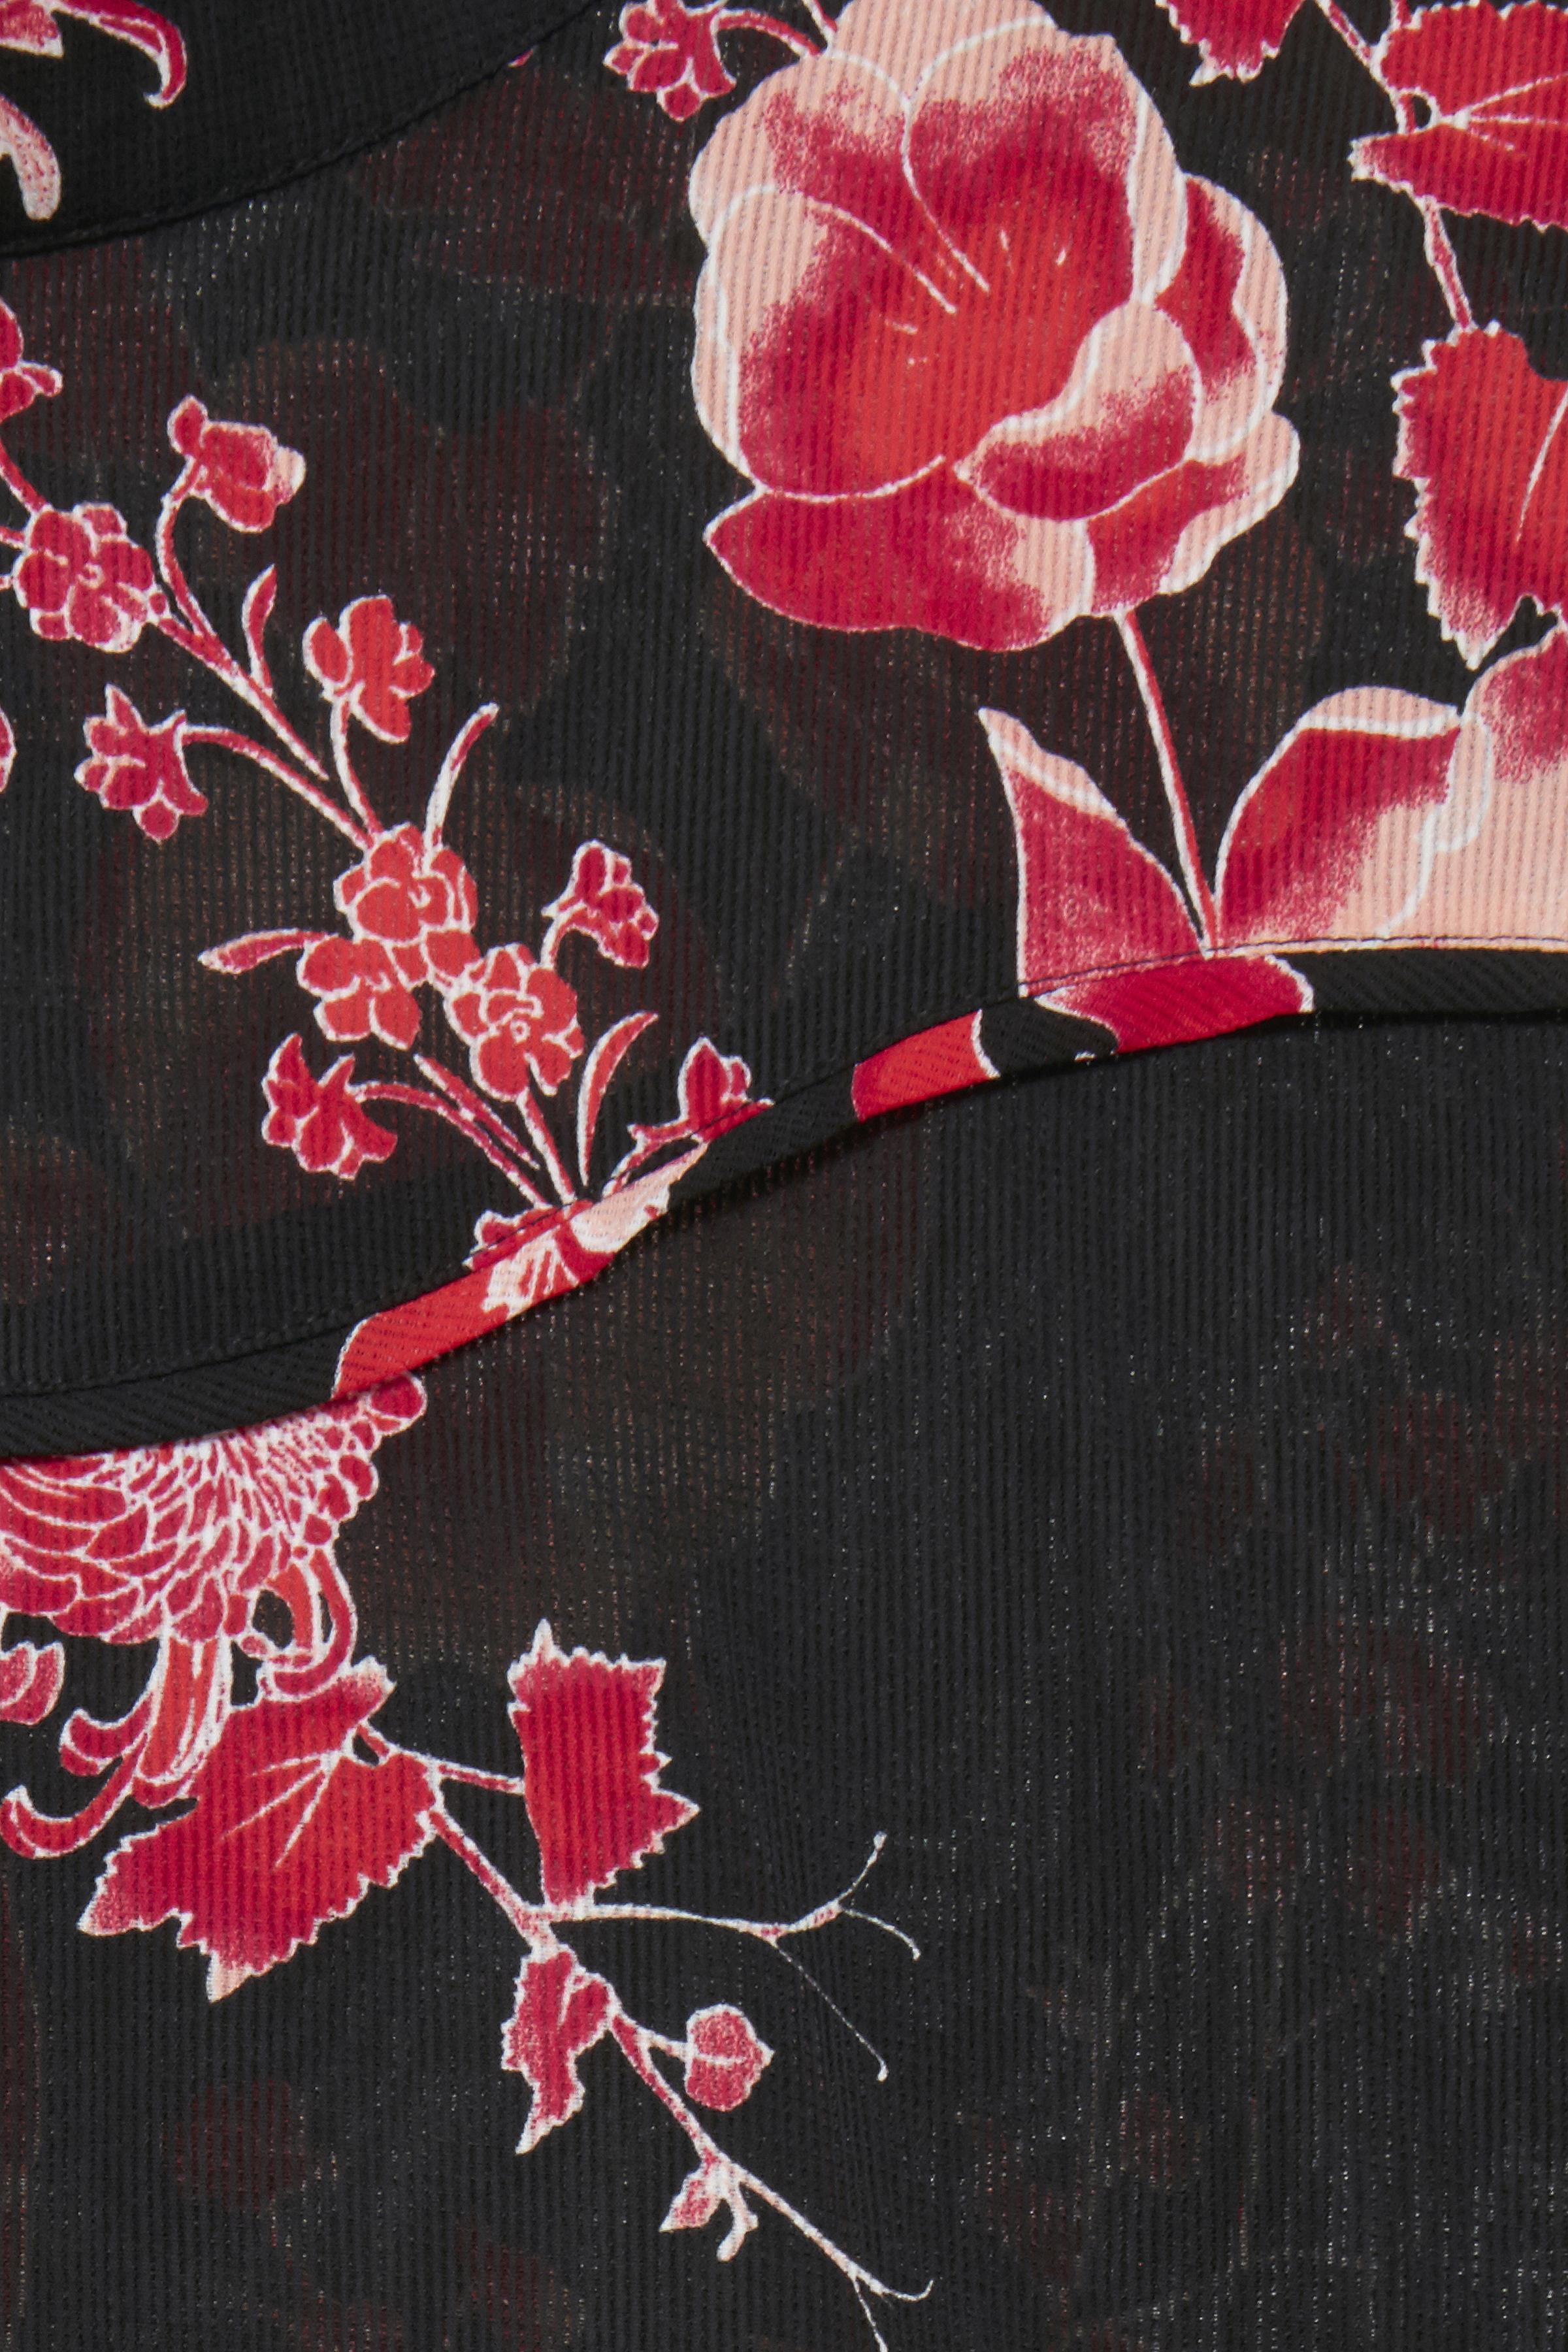 Svart/röd Långärmad blus från Dranella – Köp Svart/röd Långärmad blus från stl. XS-XXL här